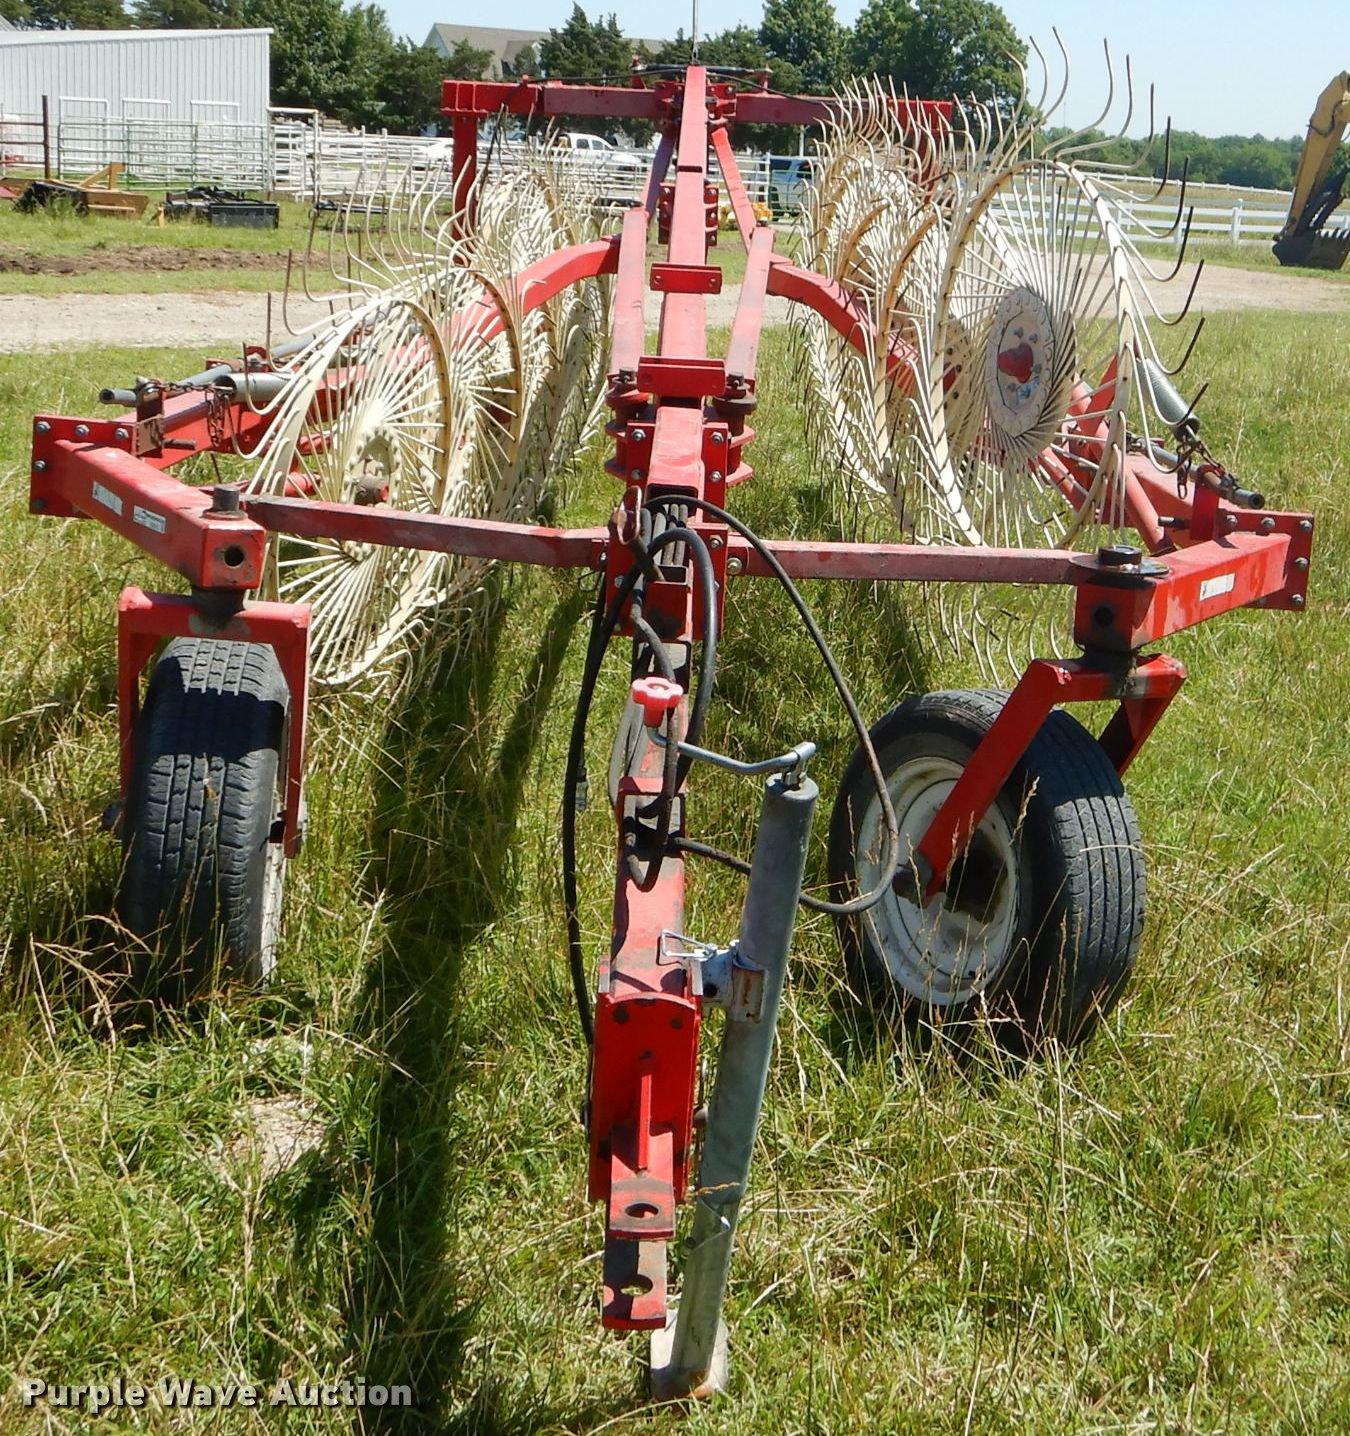 2003 Enorossi 12+3 hay rake | Item ED9312 | SOLD! July 17 Ag